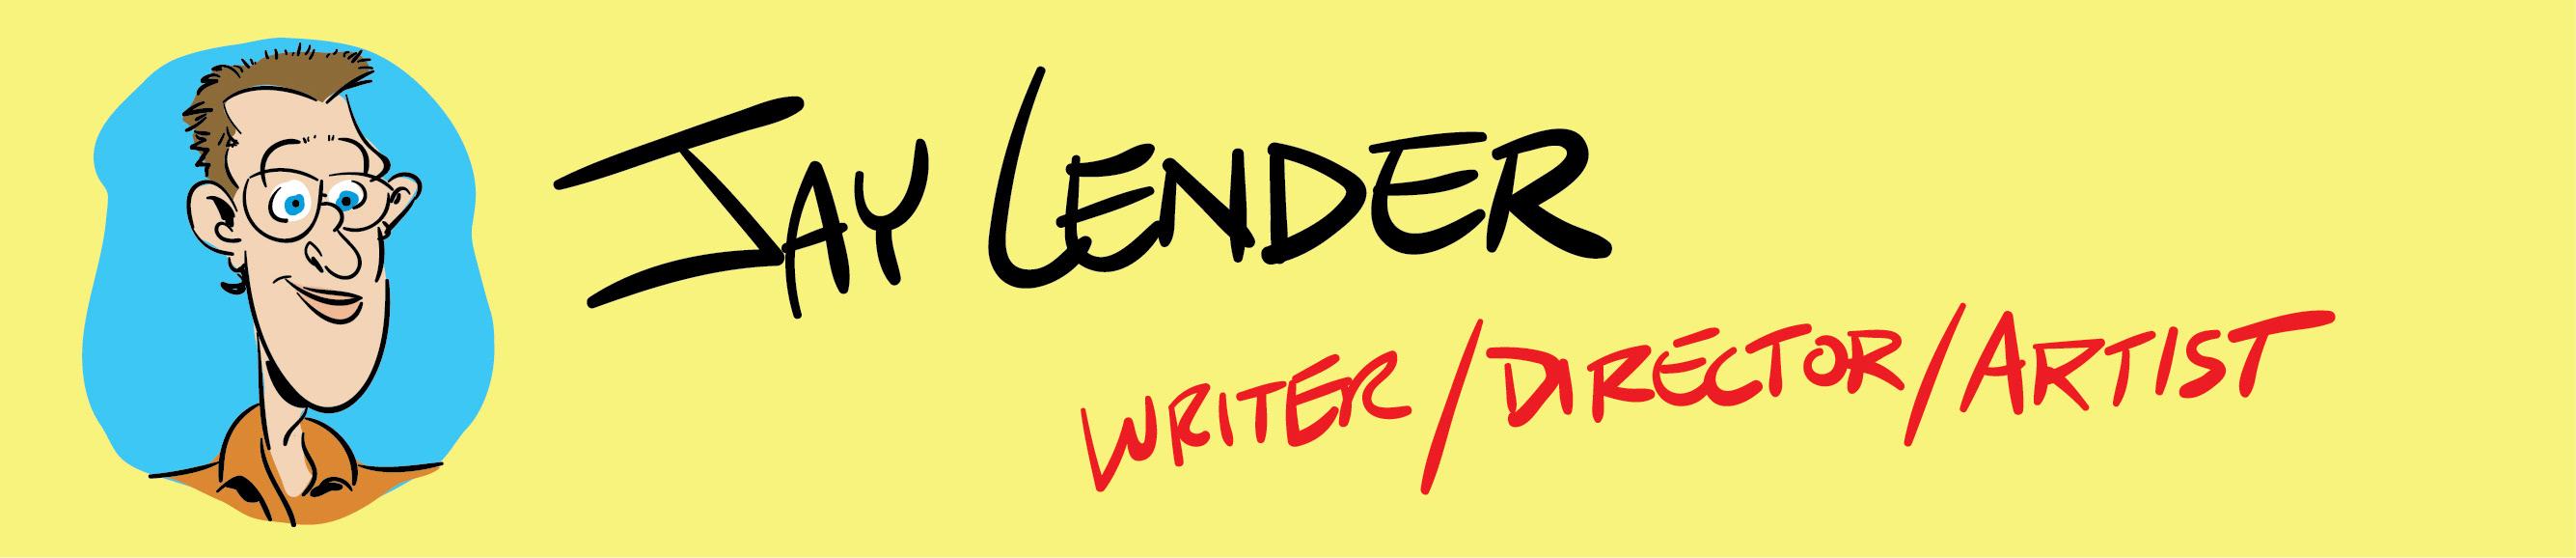 Jay Lender